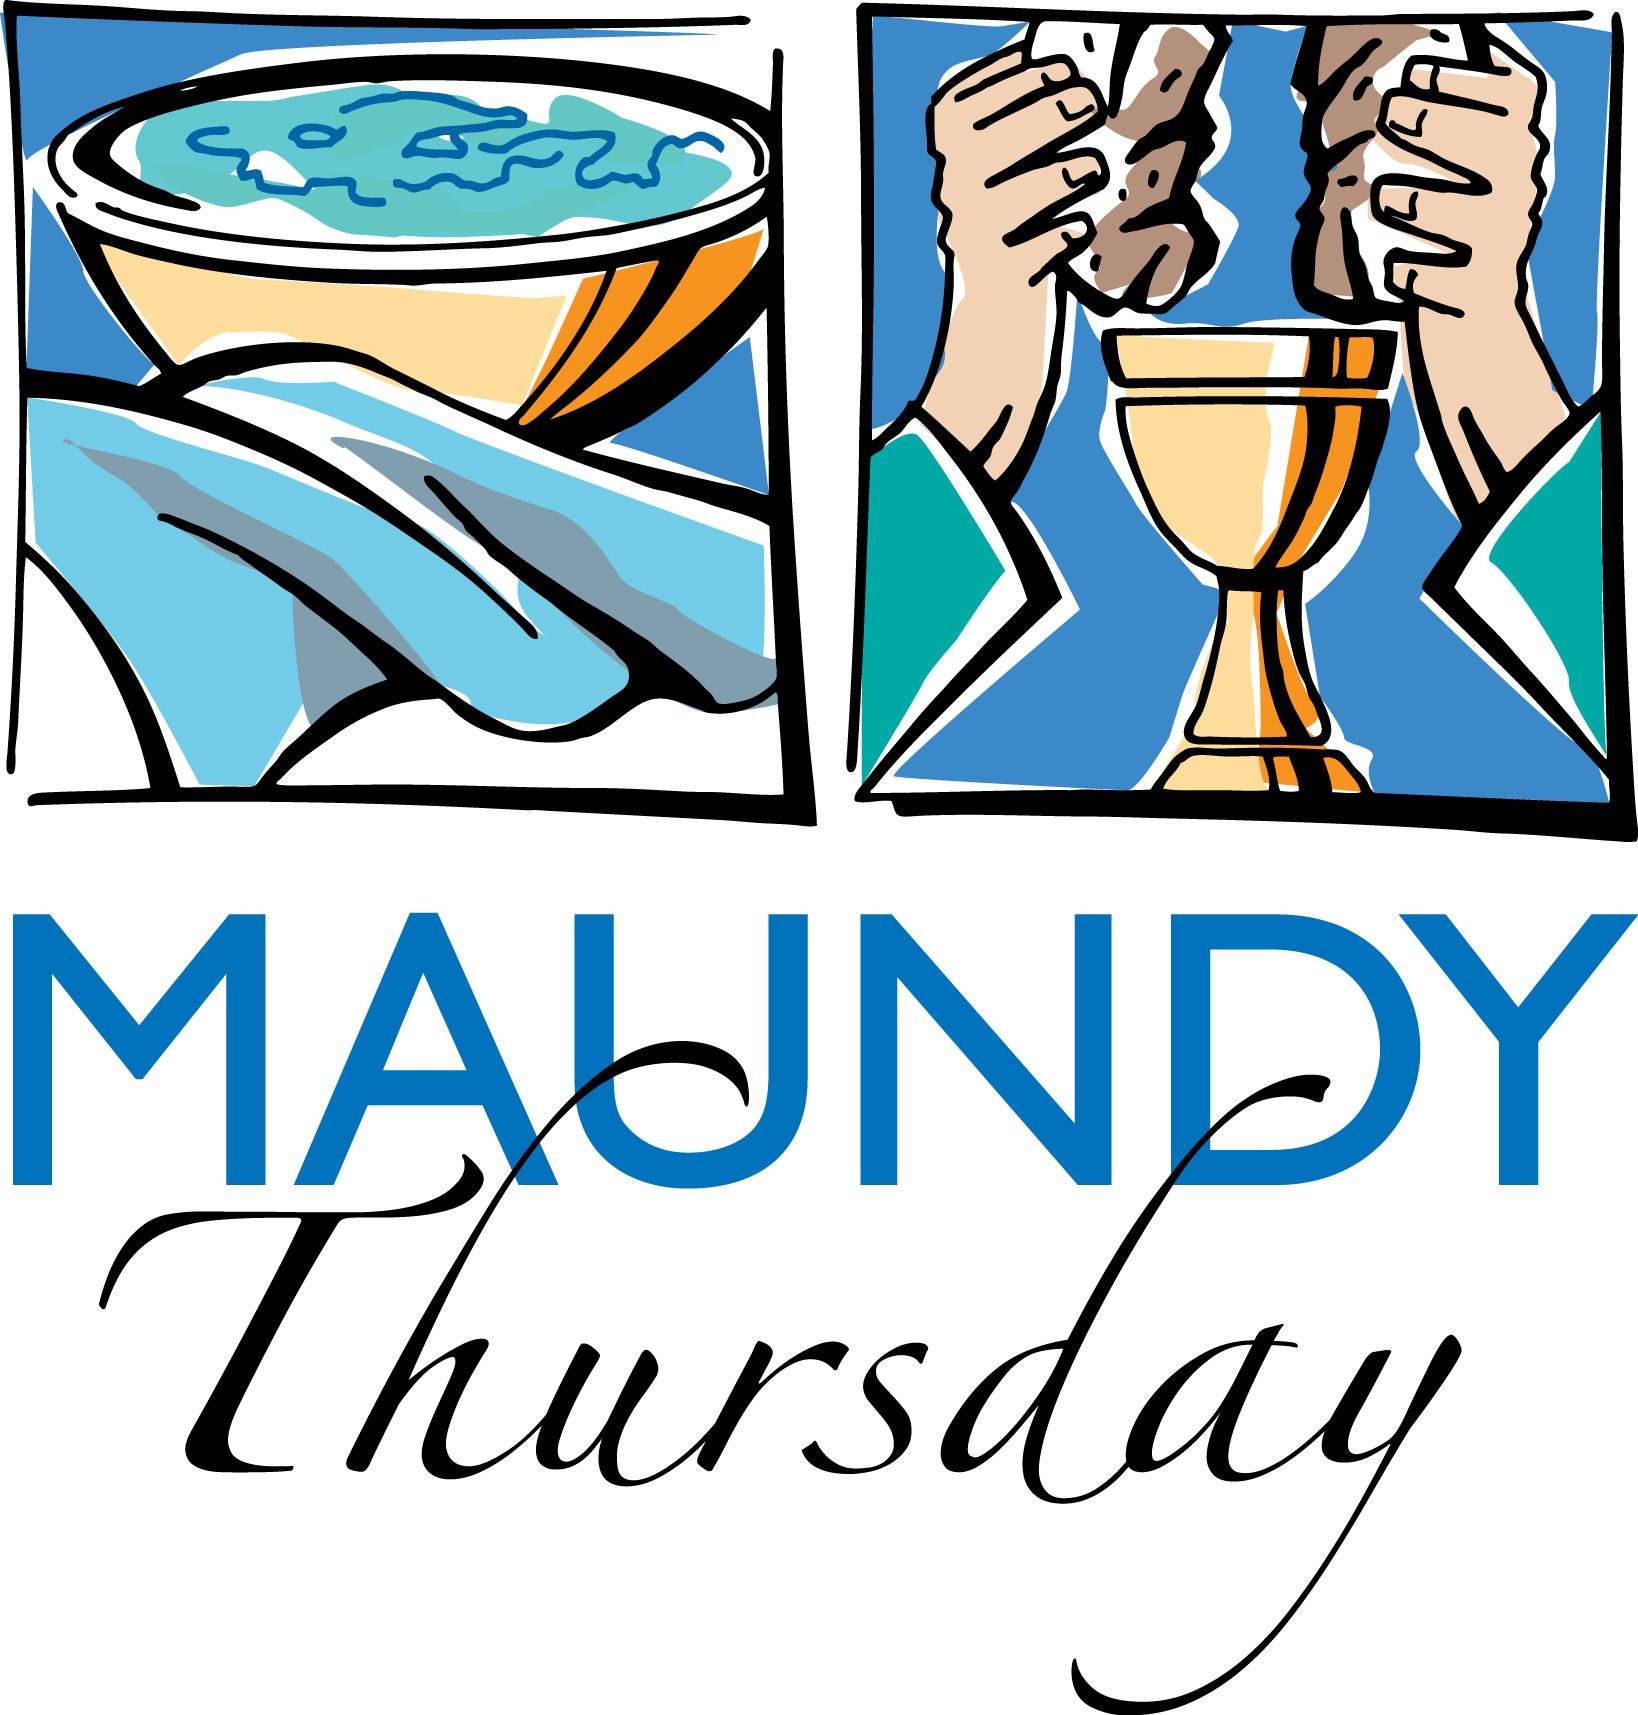 ... Maundy Thursday Clipart; Maundy Clip-... Maundy Thursday Clipart; Maundy Clipart | Free Download Clip Art | Free Clip Art | on .-3